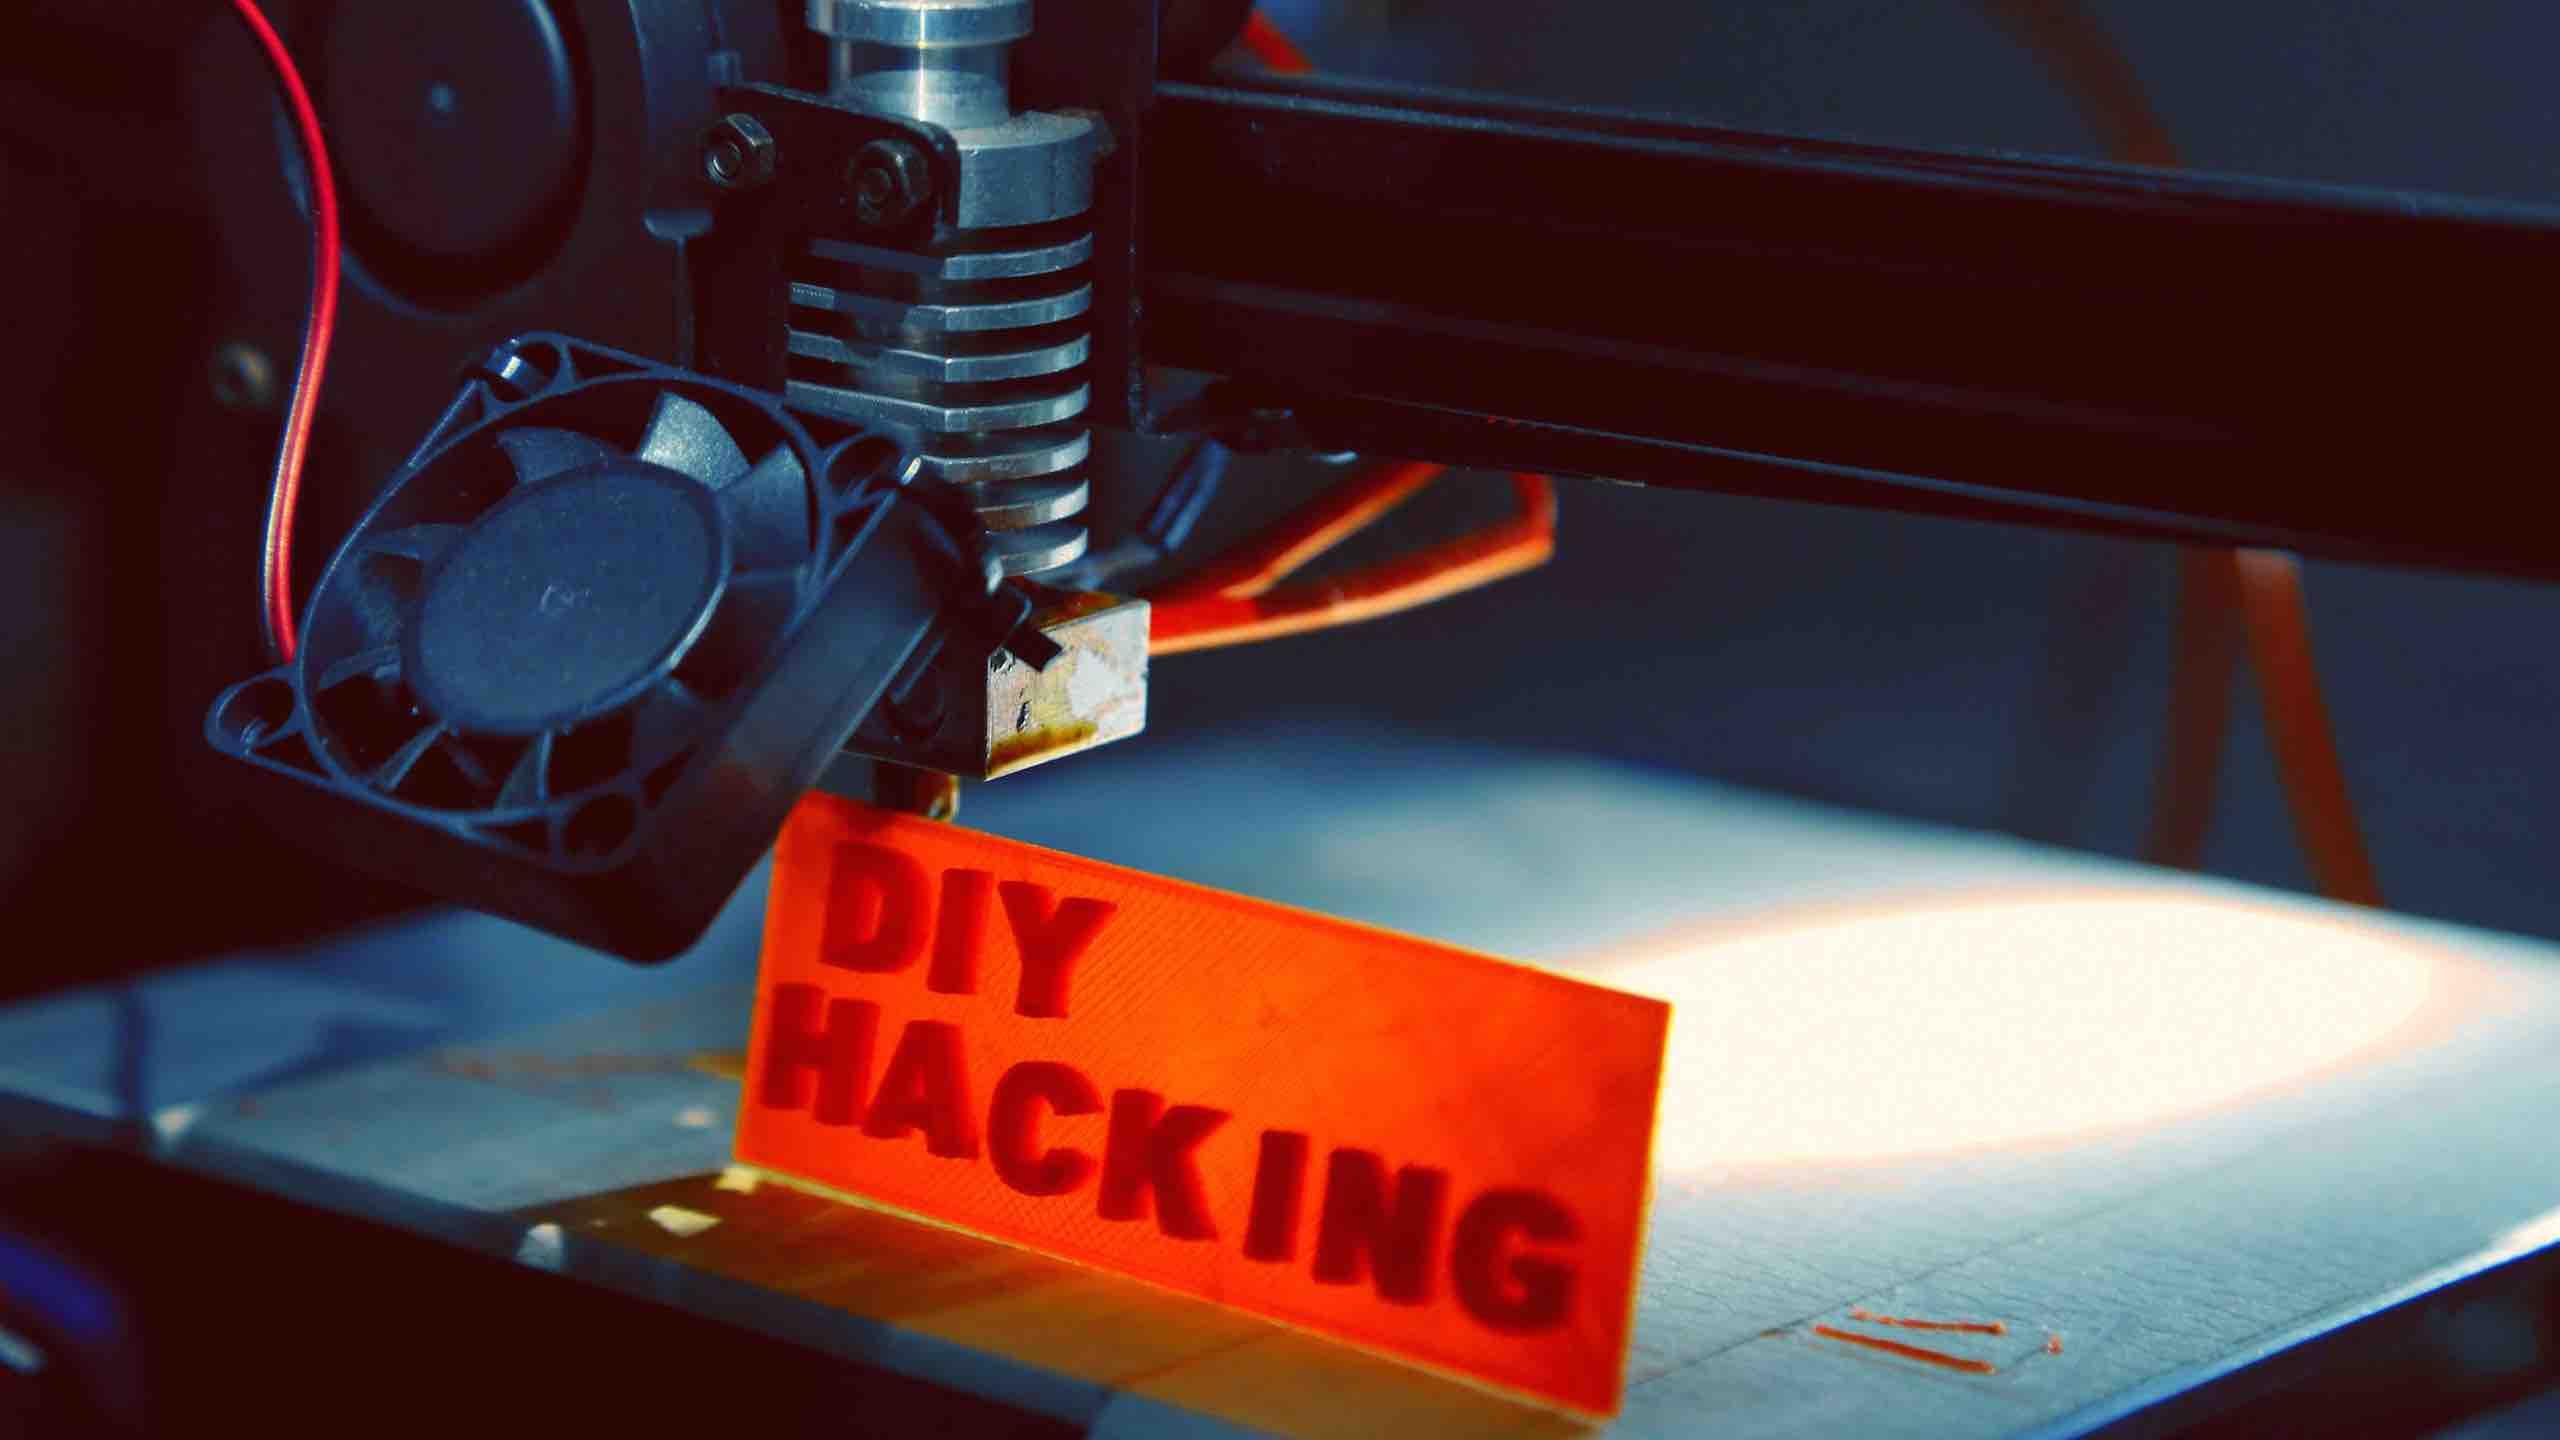 DIY Hacking - Sparking the Maker Movement!